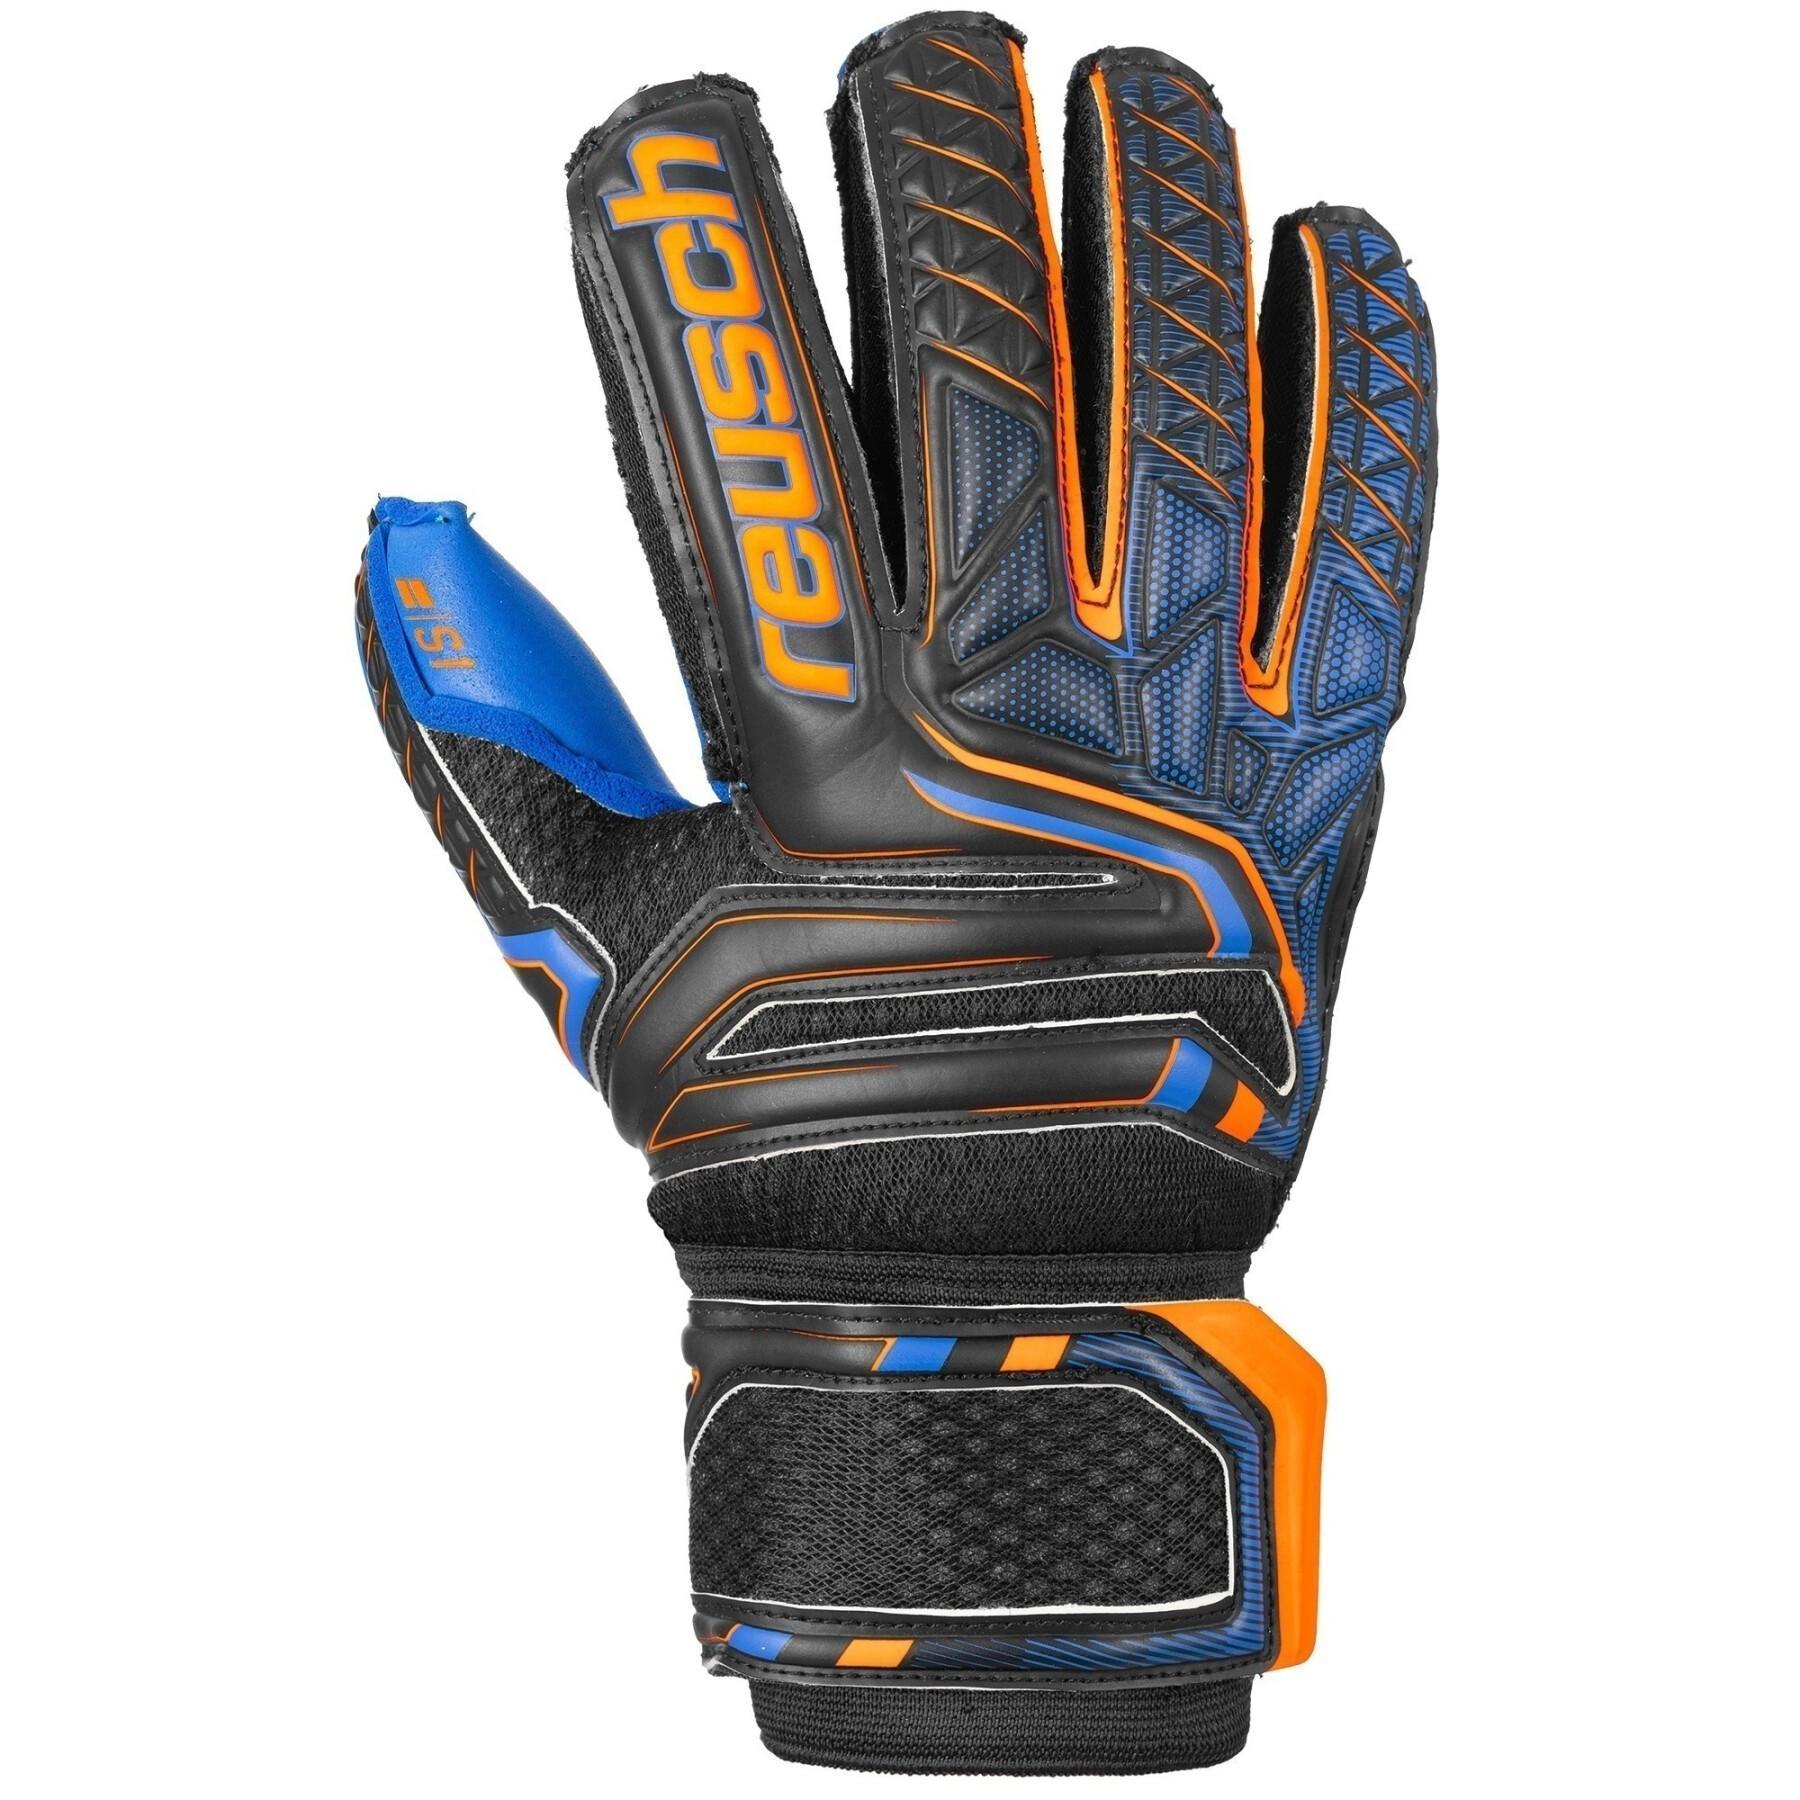 Gants junior Reusch Attrakt S1 Finger Support